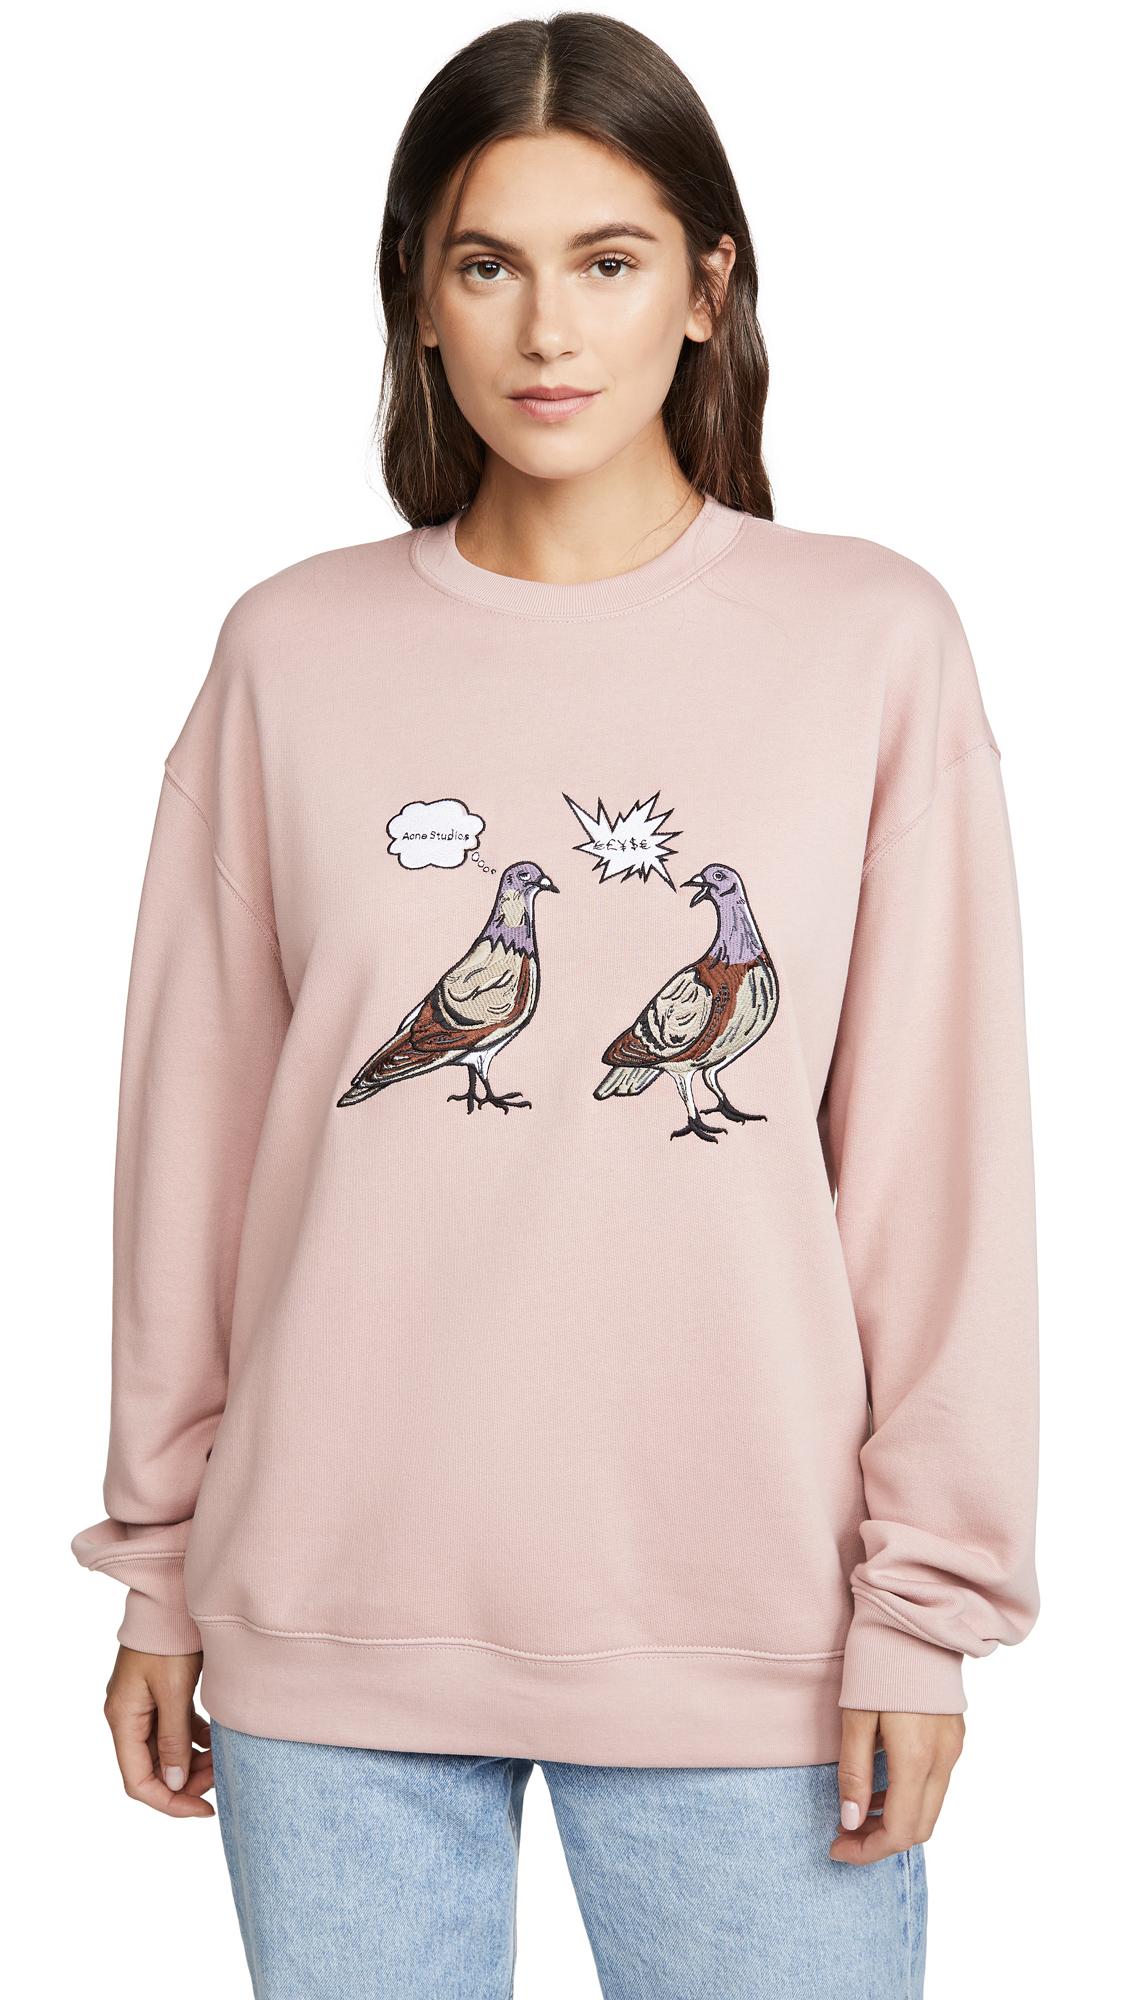 Acne Studios Forba Animal Embellished Sweatshirt - Old Pink